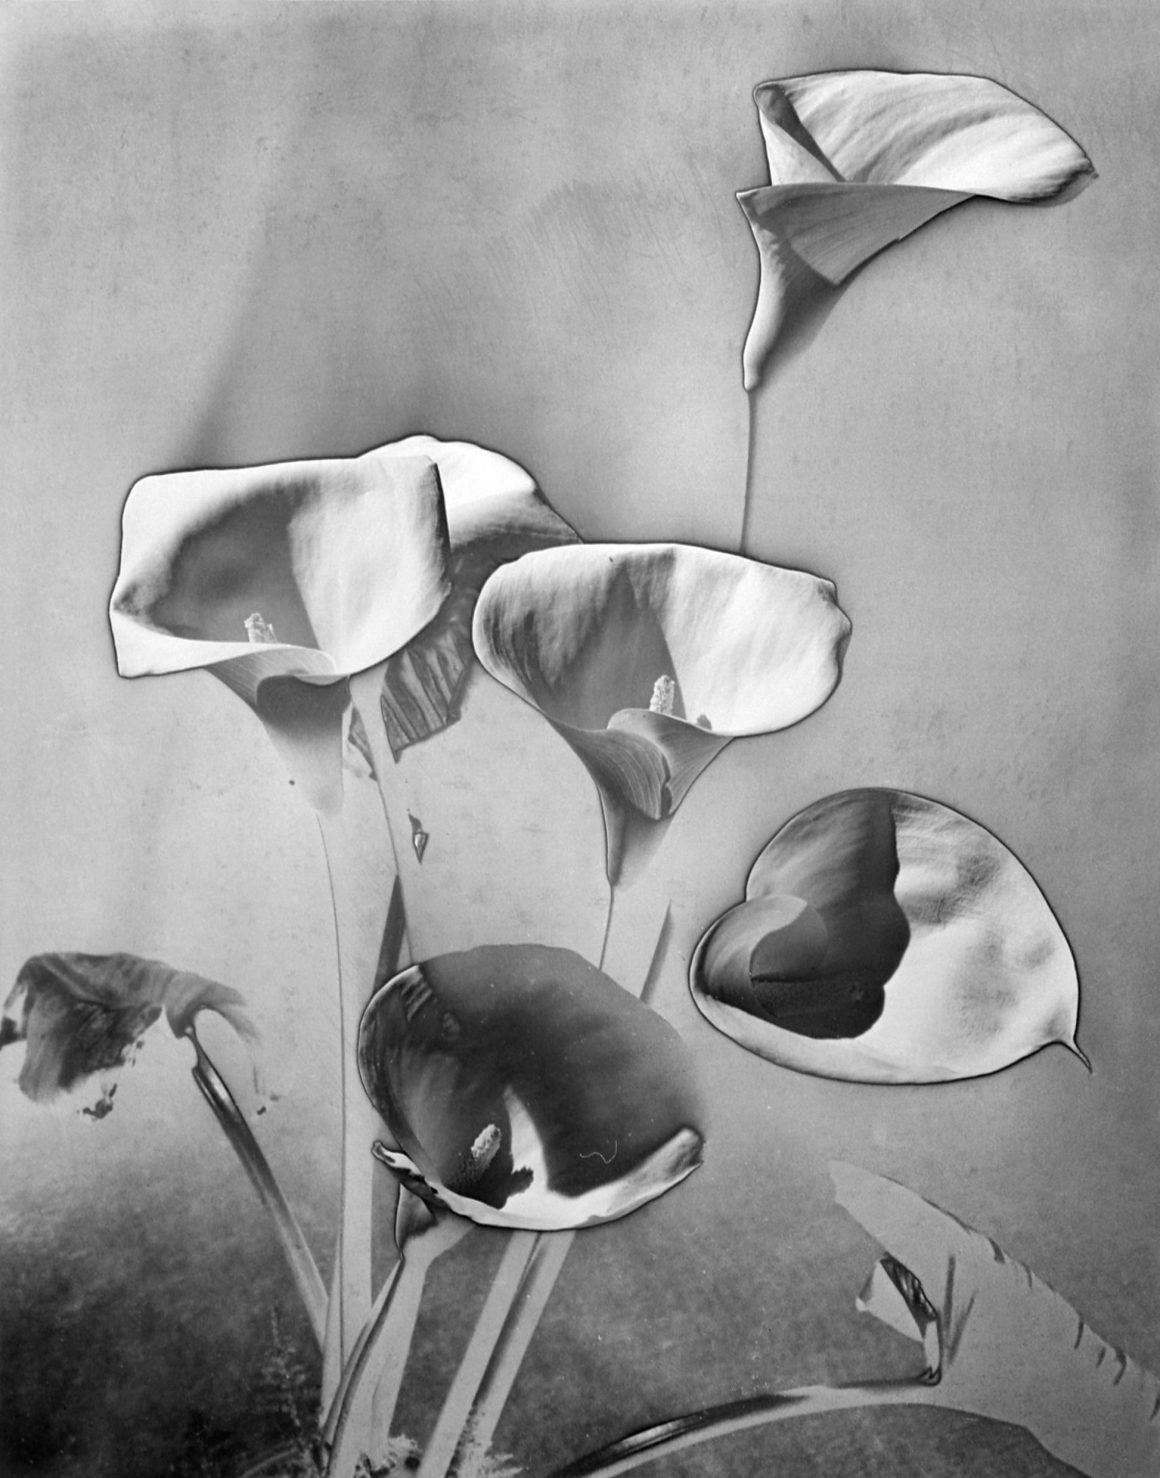 Les Arums c. 1930 Gelatin Silver print (Estate print) 30 X 24 cm © Man Ray Trust – ADAGP / courtesy MONDO GALERIA | TARQ